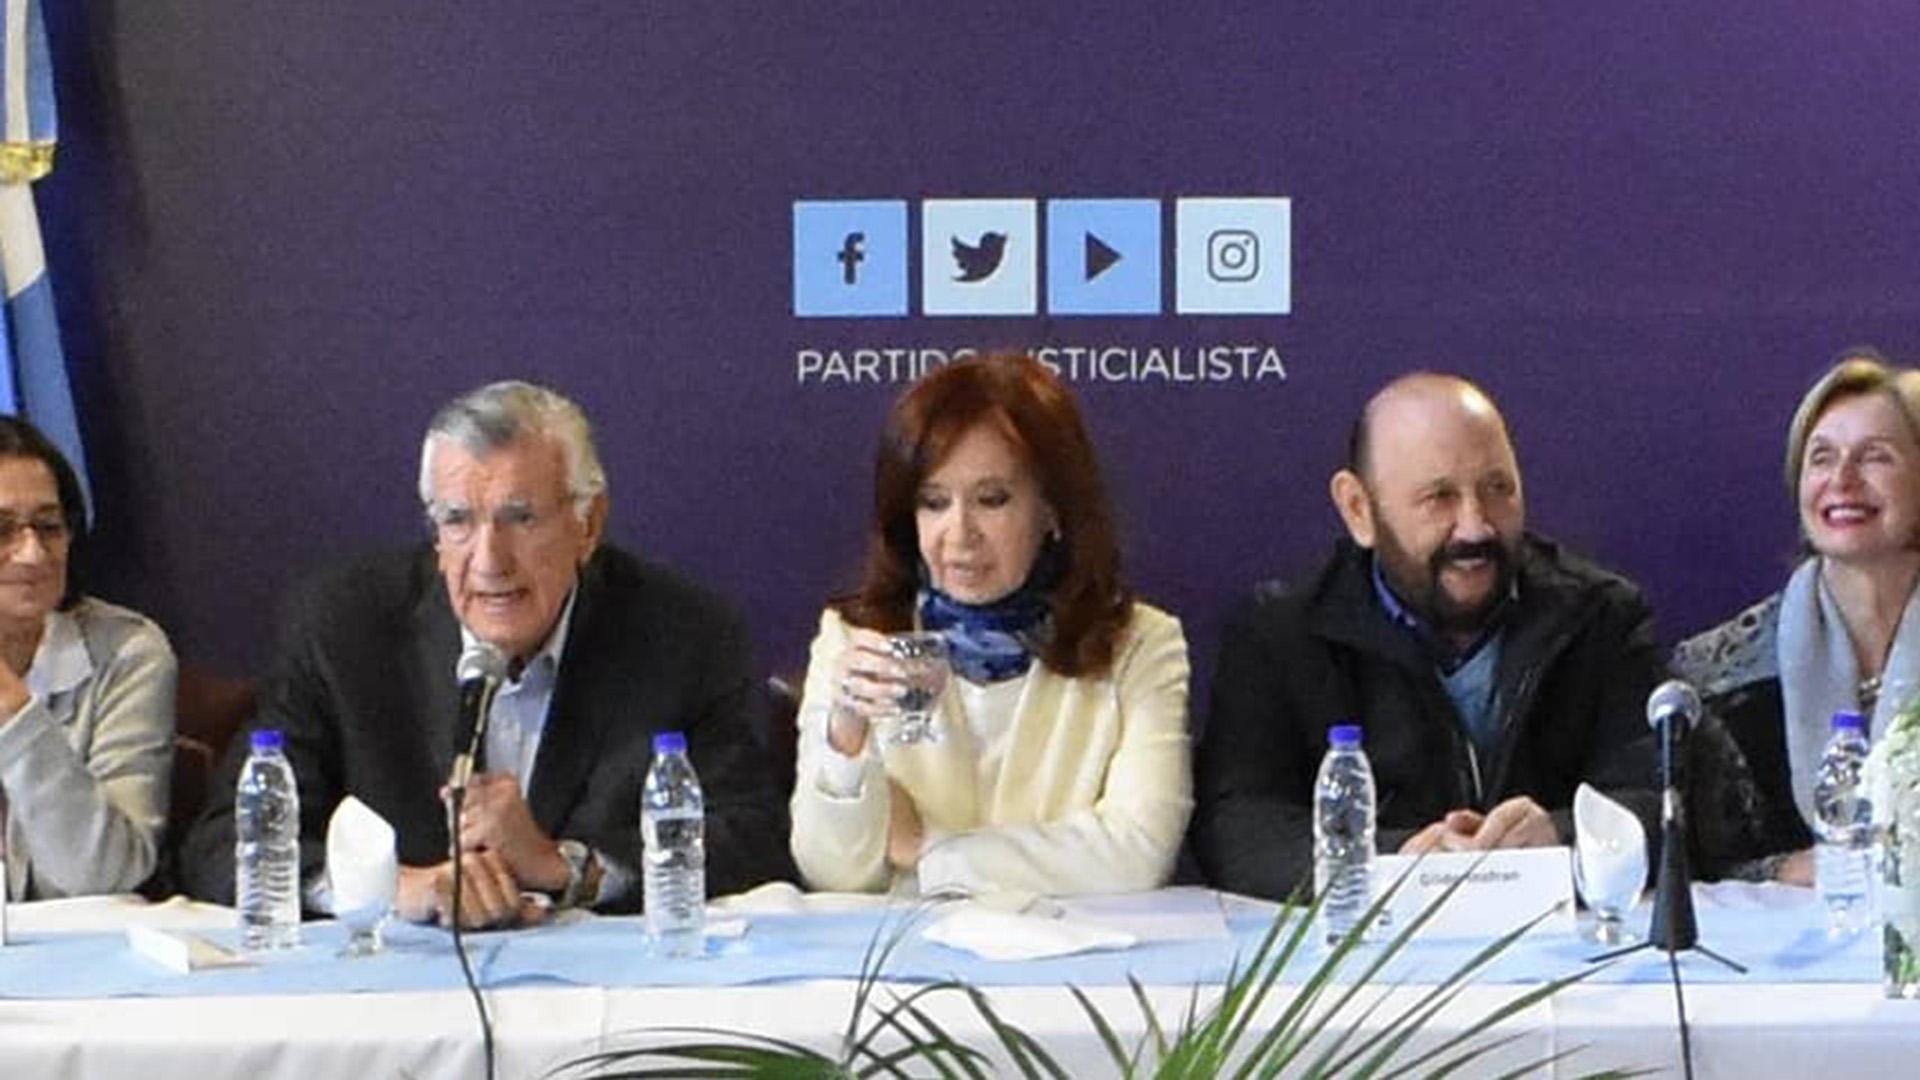 Después de casi dos décadas Cristina Kirchner fue a la sede del PJ en la calle Matheu del centro porteño